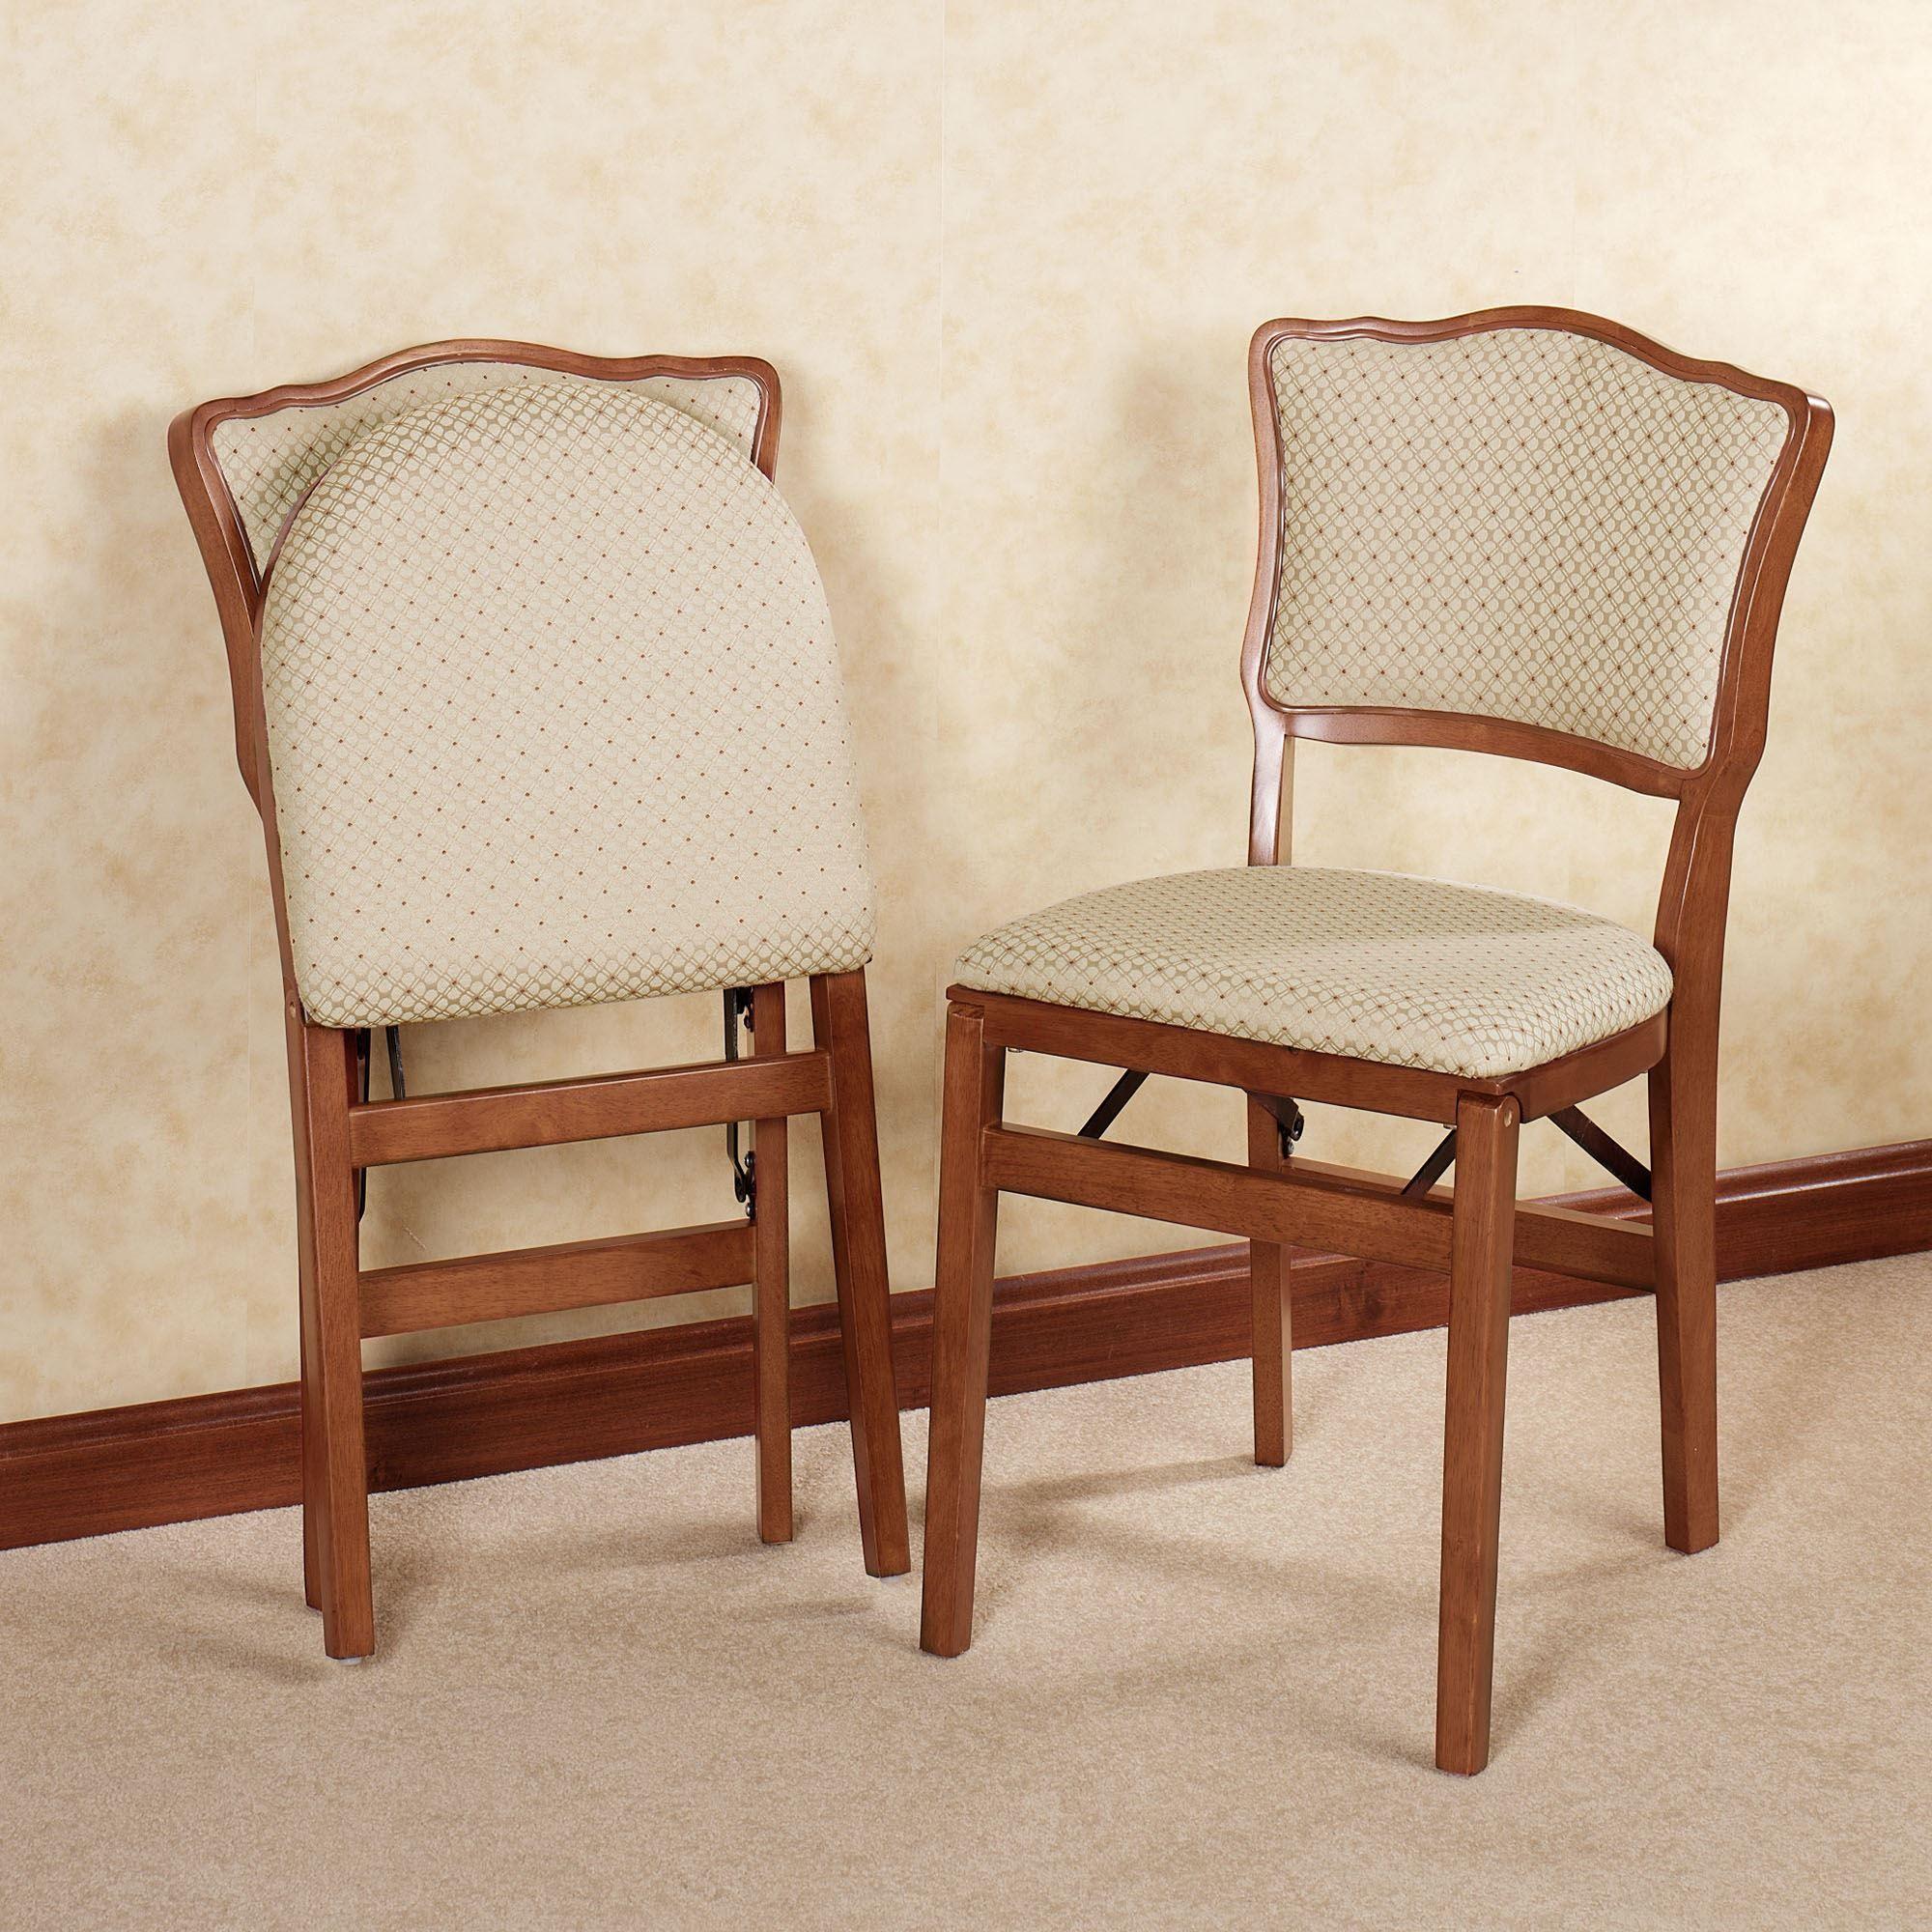 Dover Upholstered Folding Chair Pair